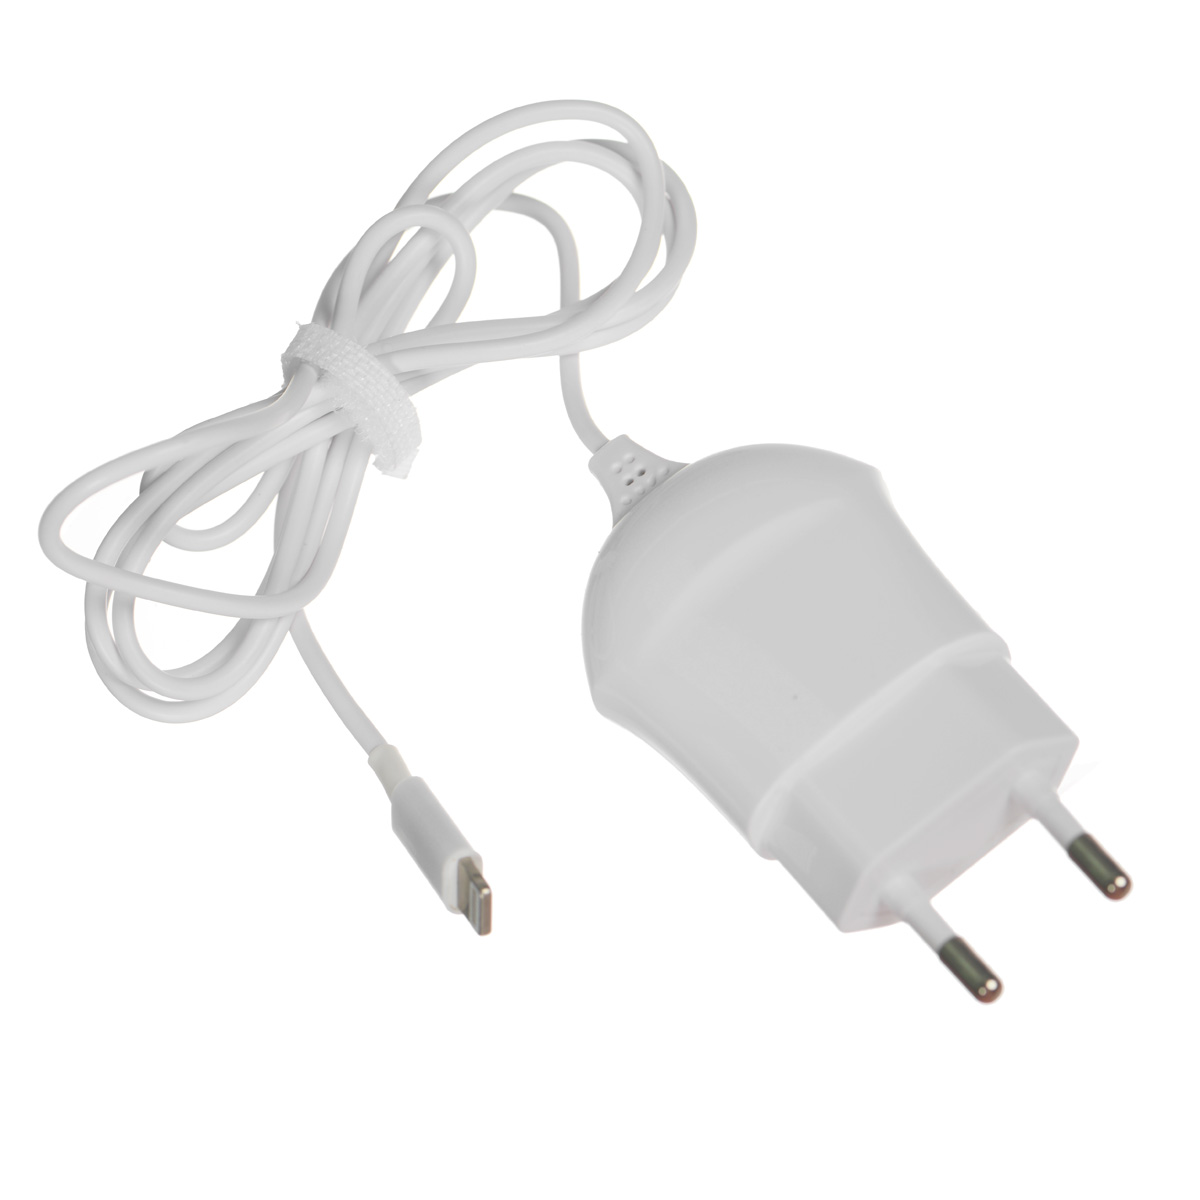 Deppa Wall Charger 1A, White сетевое зарядное устройство с разъемом 8-pin стоимость